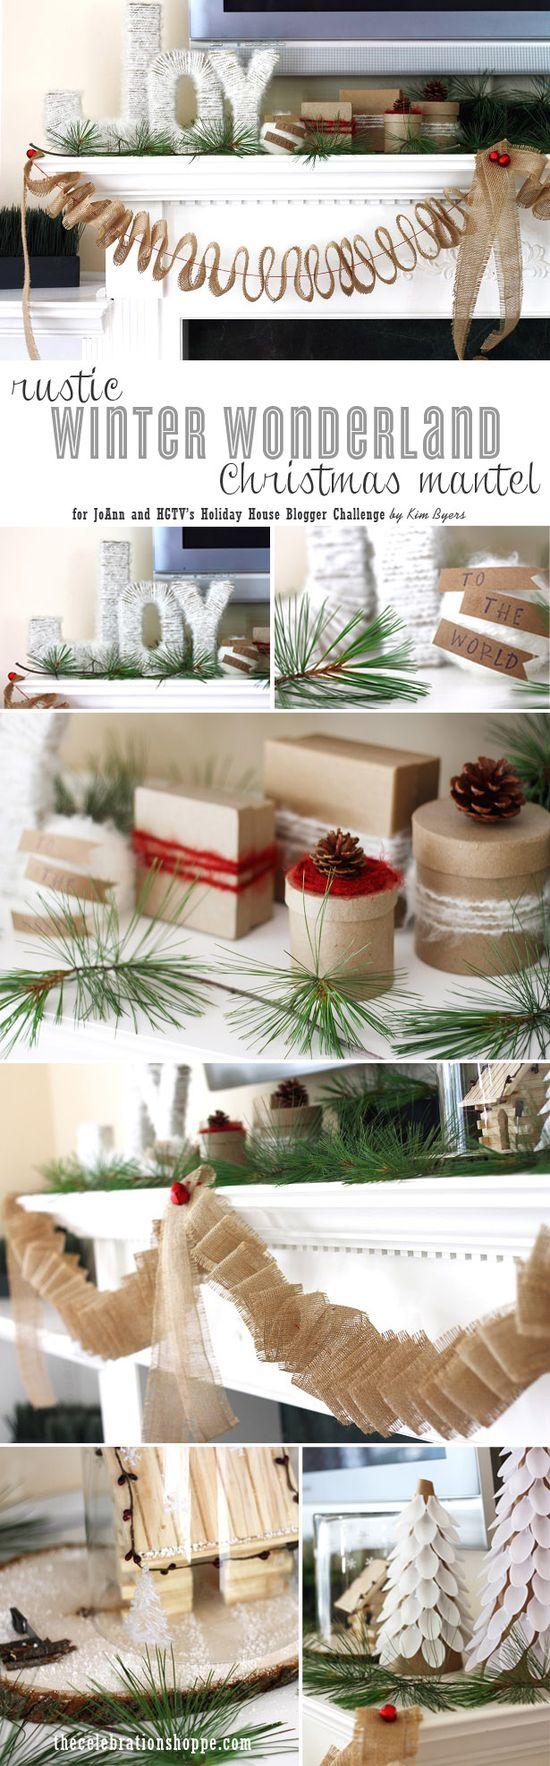 Rustic Winter Wonderland Christmas Mantel DIY